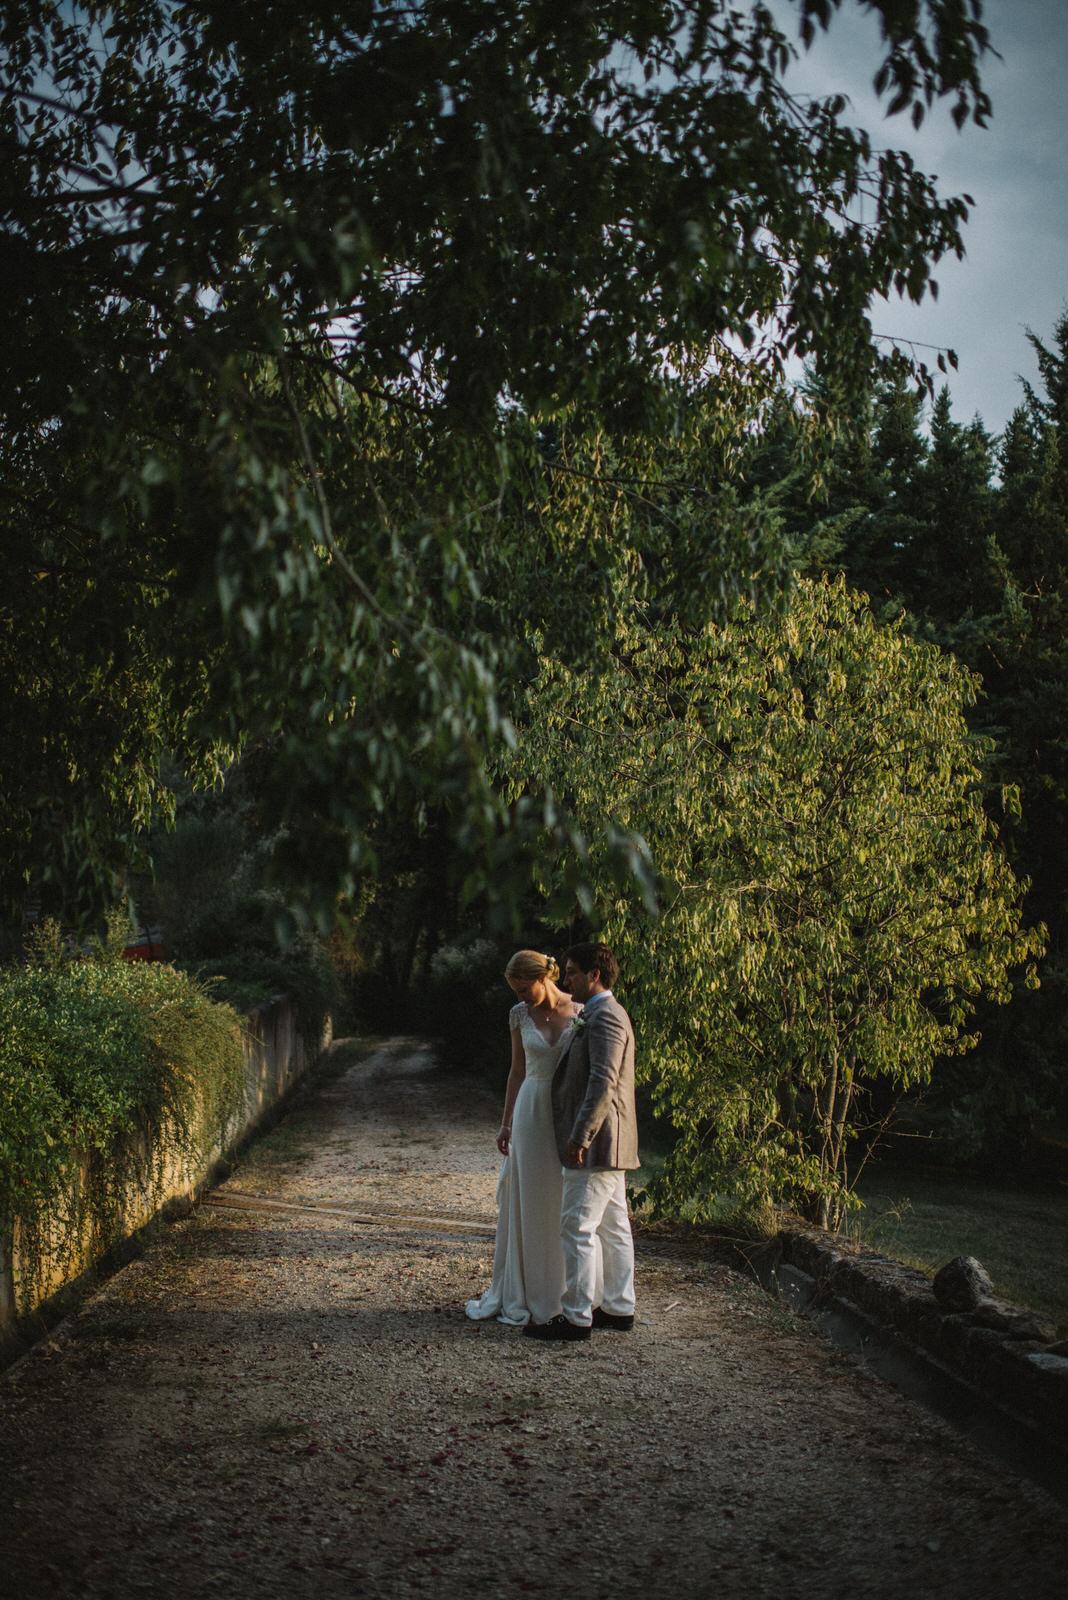 027-LOURMARIN-WEDDING-PHOTOGRAPHER-PROVENCE-WEDDING-ALTERNATIVE-WEDDING-PHOTOGRAPHY-FRANCE-PROVENCE-GARDEN-WEDDING.JPG